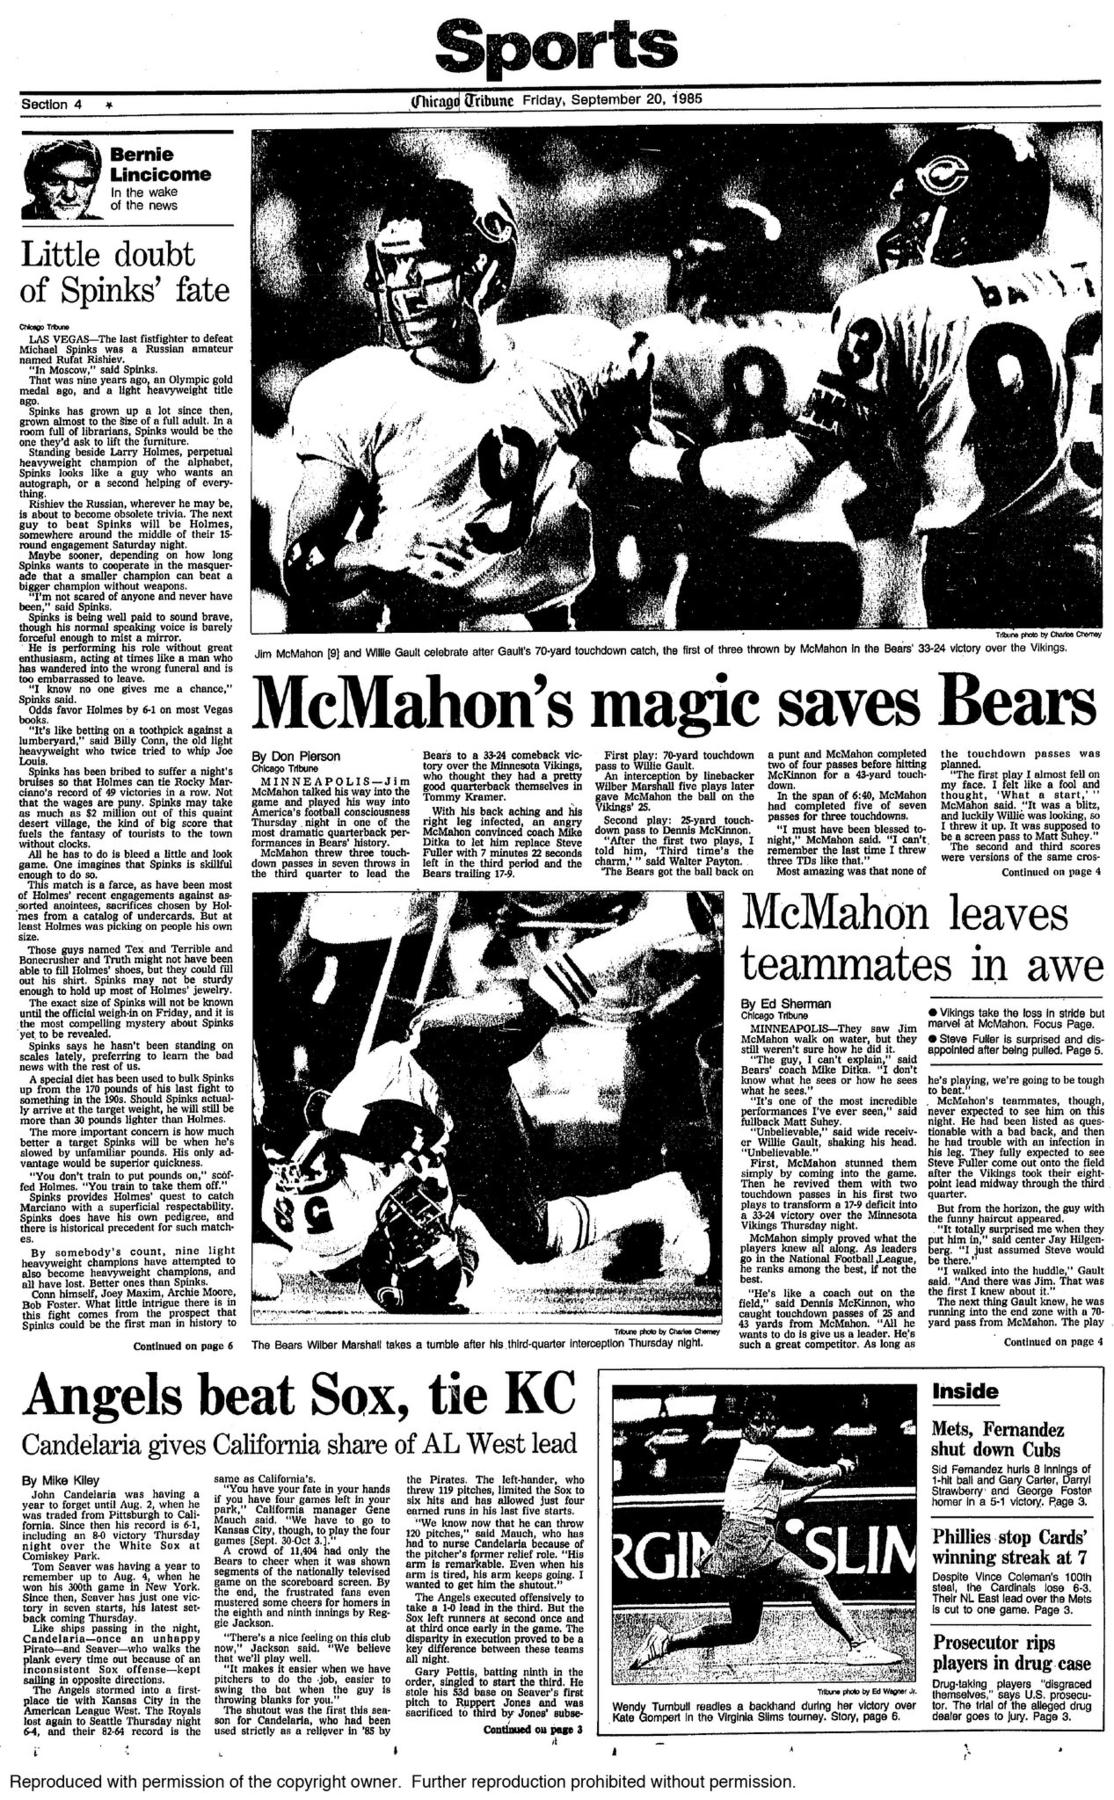 Sept. 19, 1985: McMahon's Minnesota Miracle